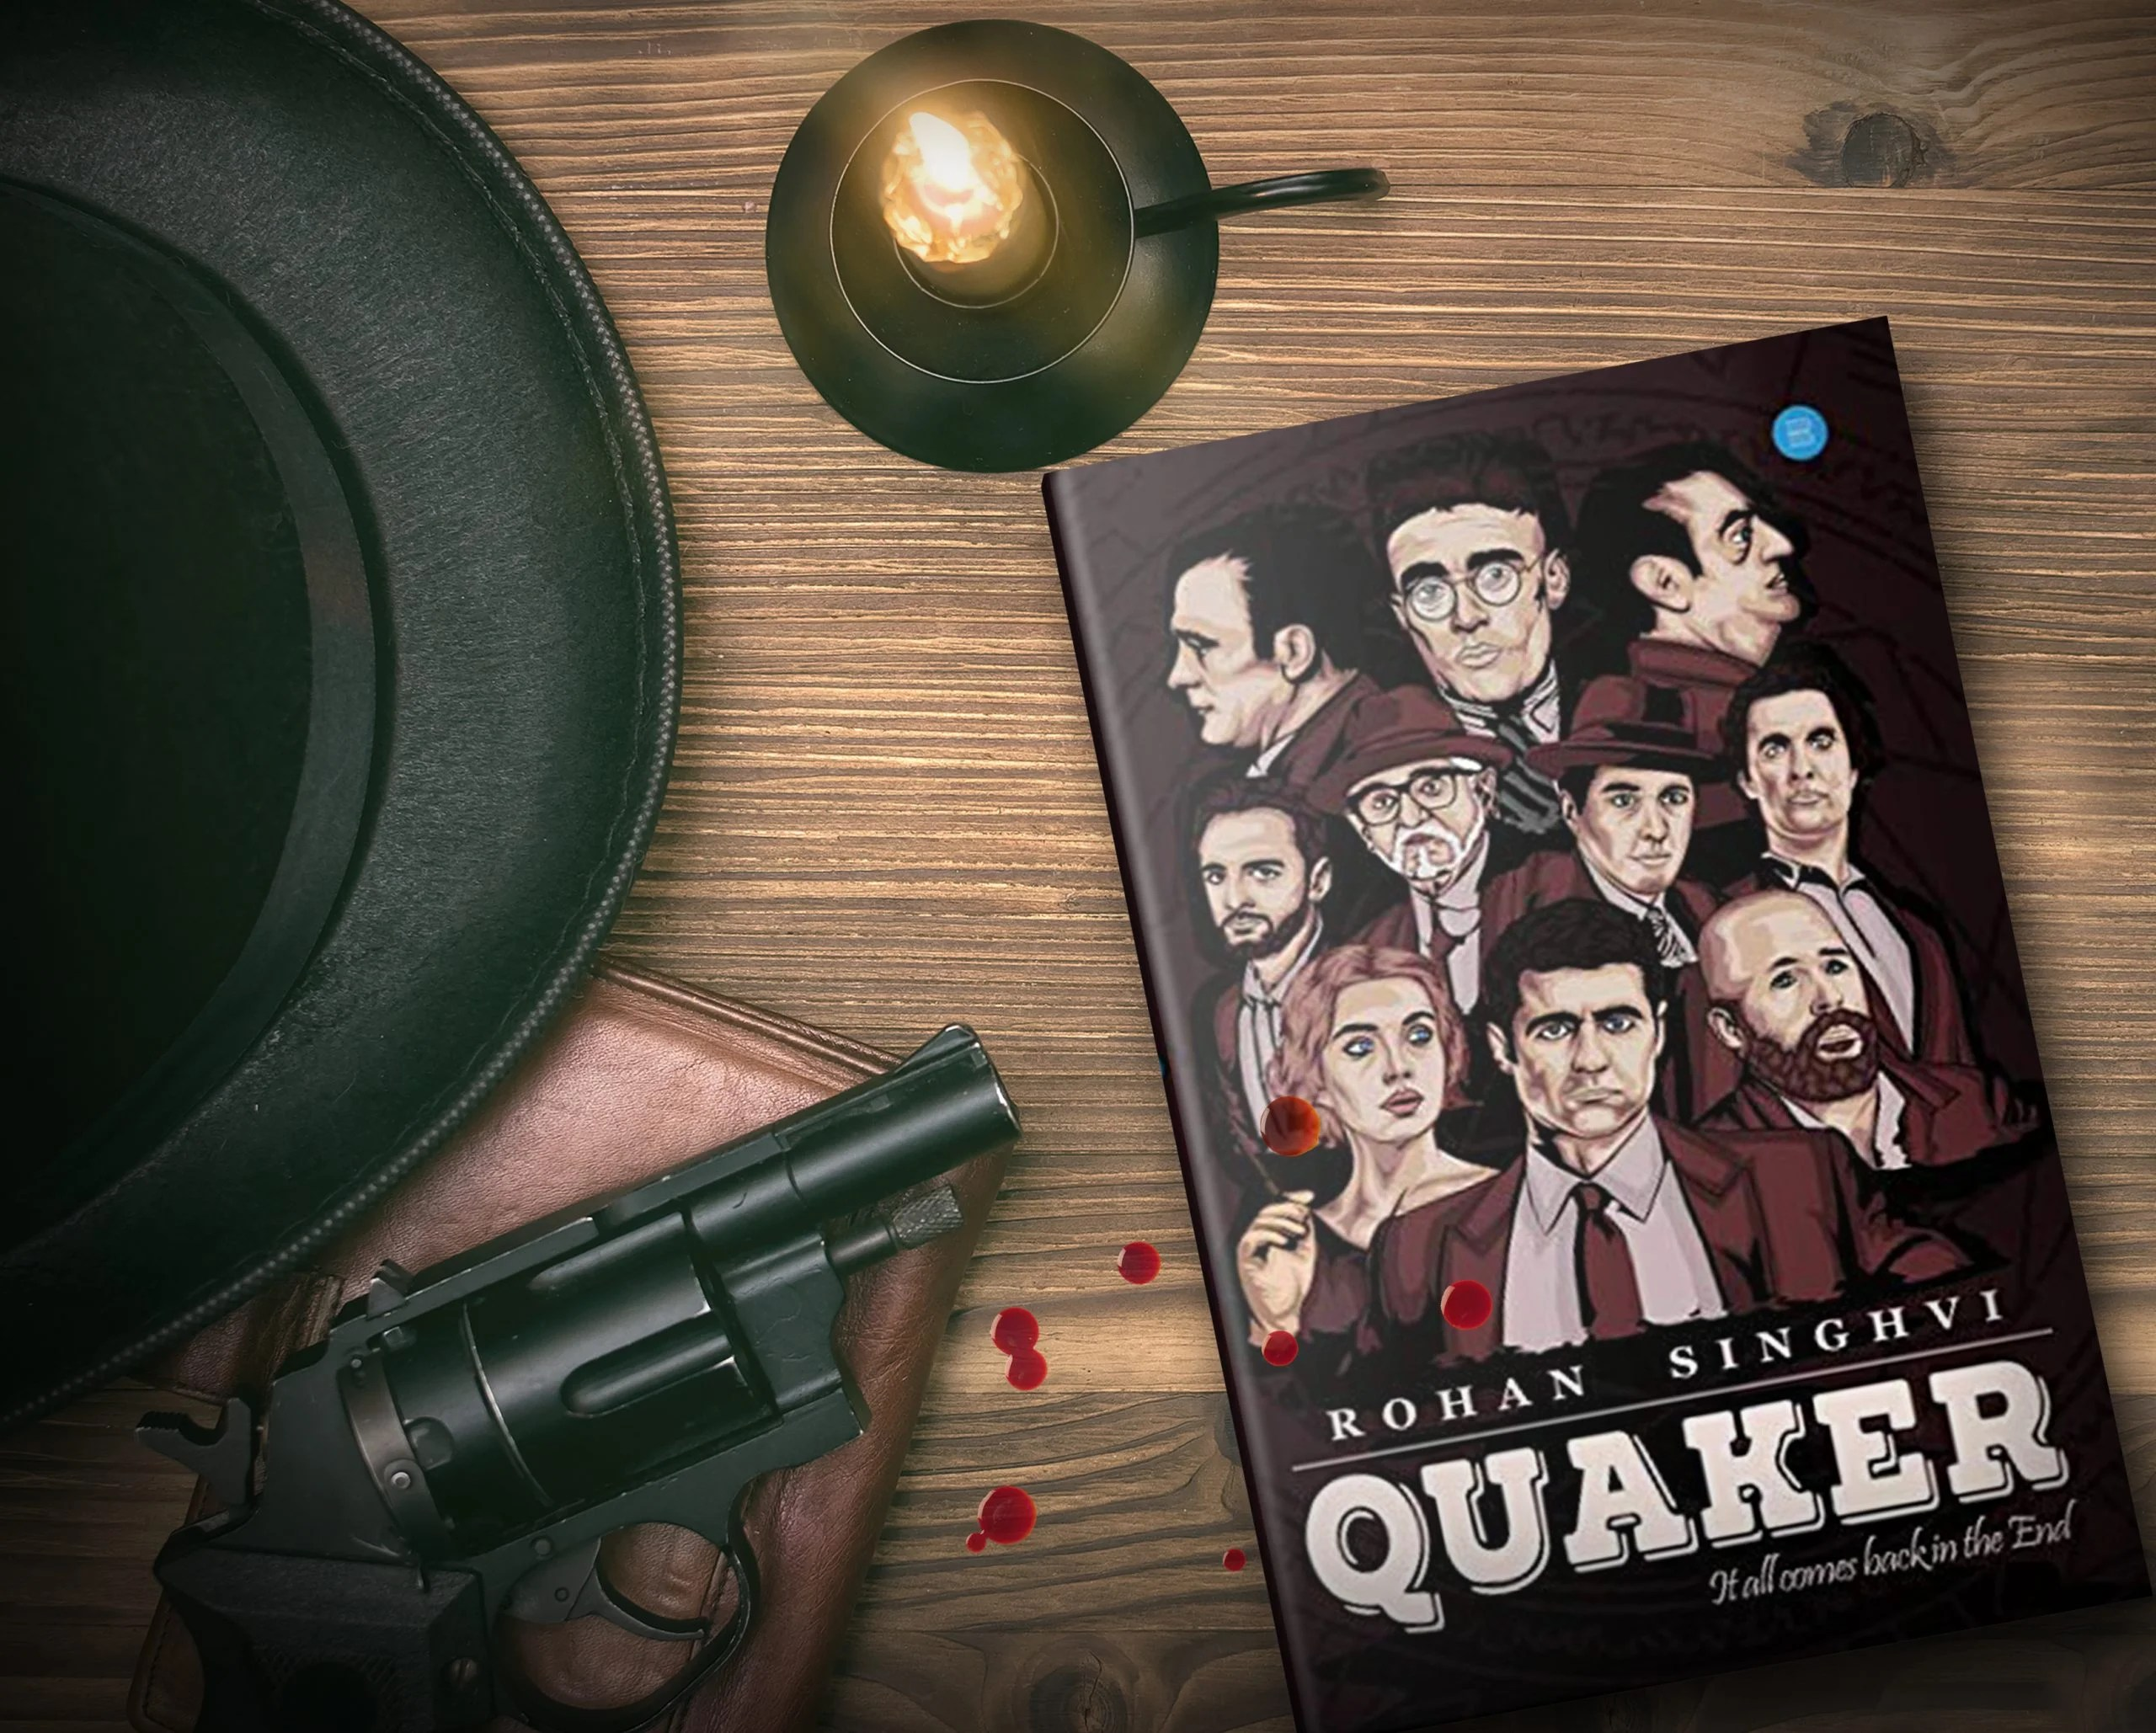 Quaker by Rohan Singhvi